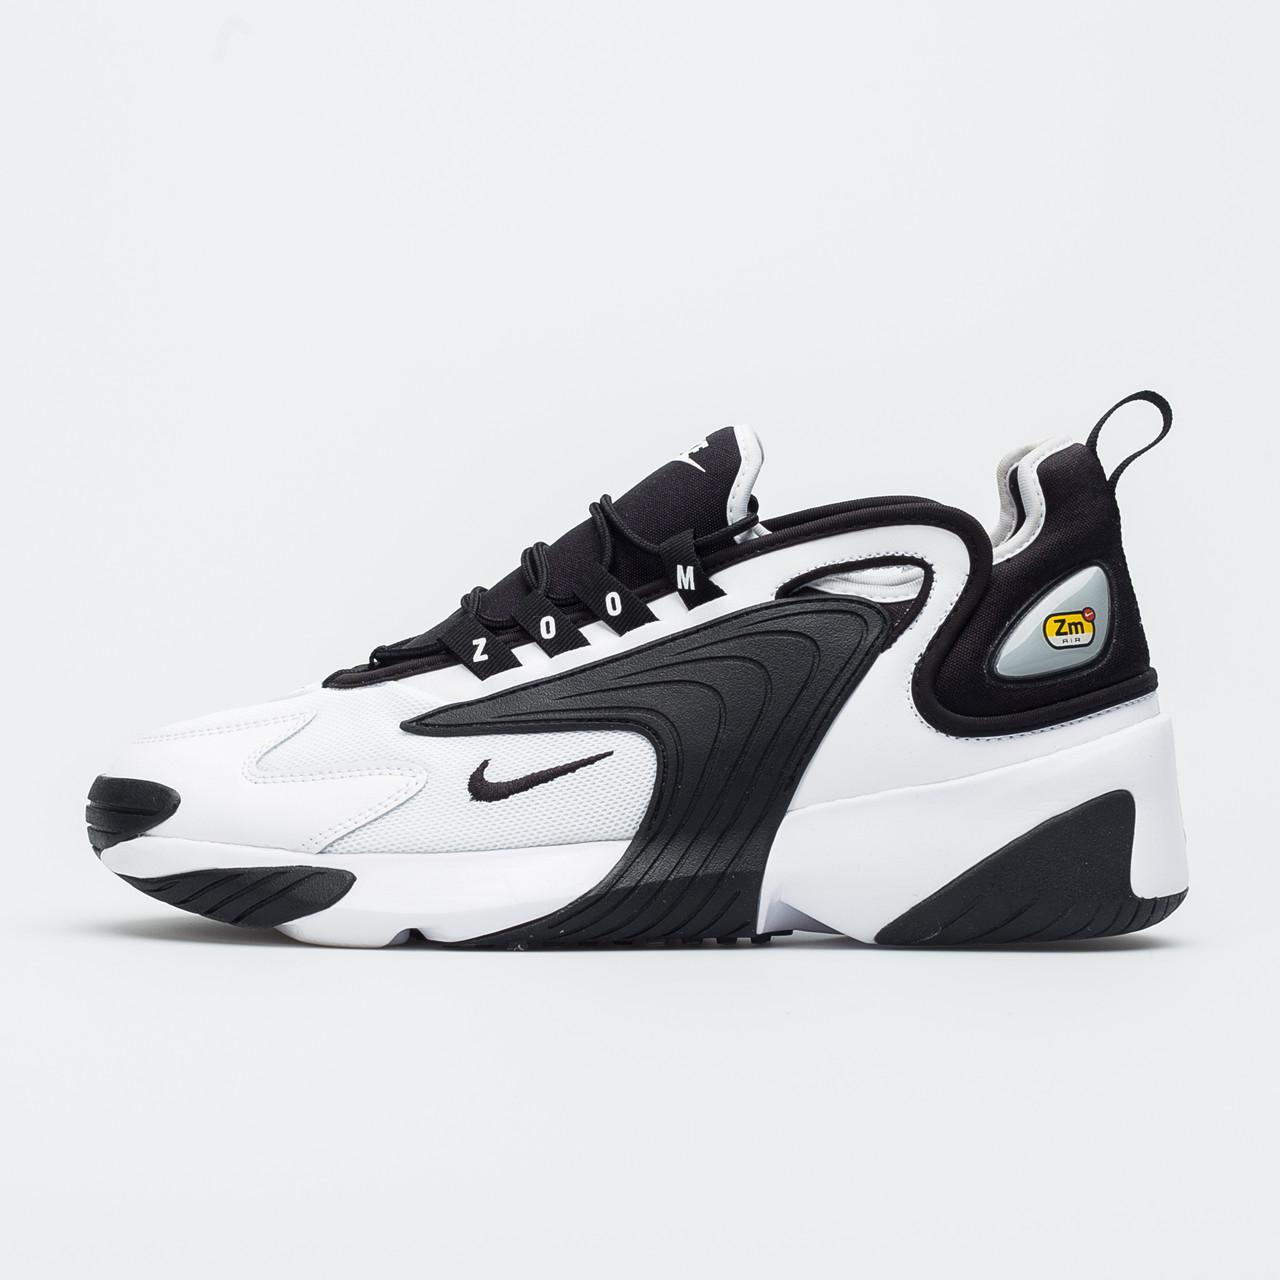 11b22502 Мужские кроссовки Nike Zoom 2K AO0269-101 - Интернет-магазин